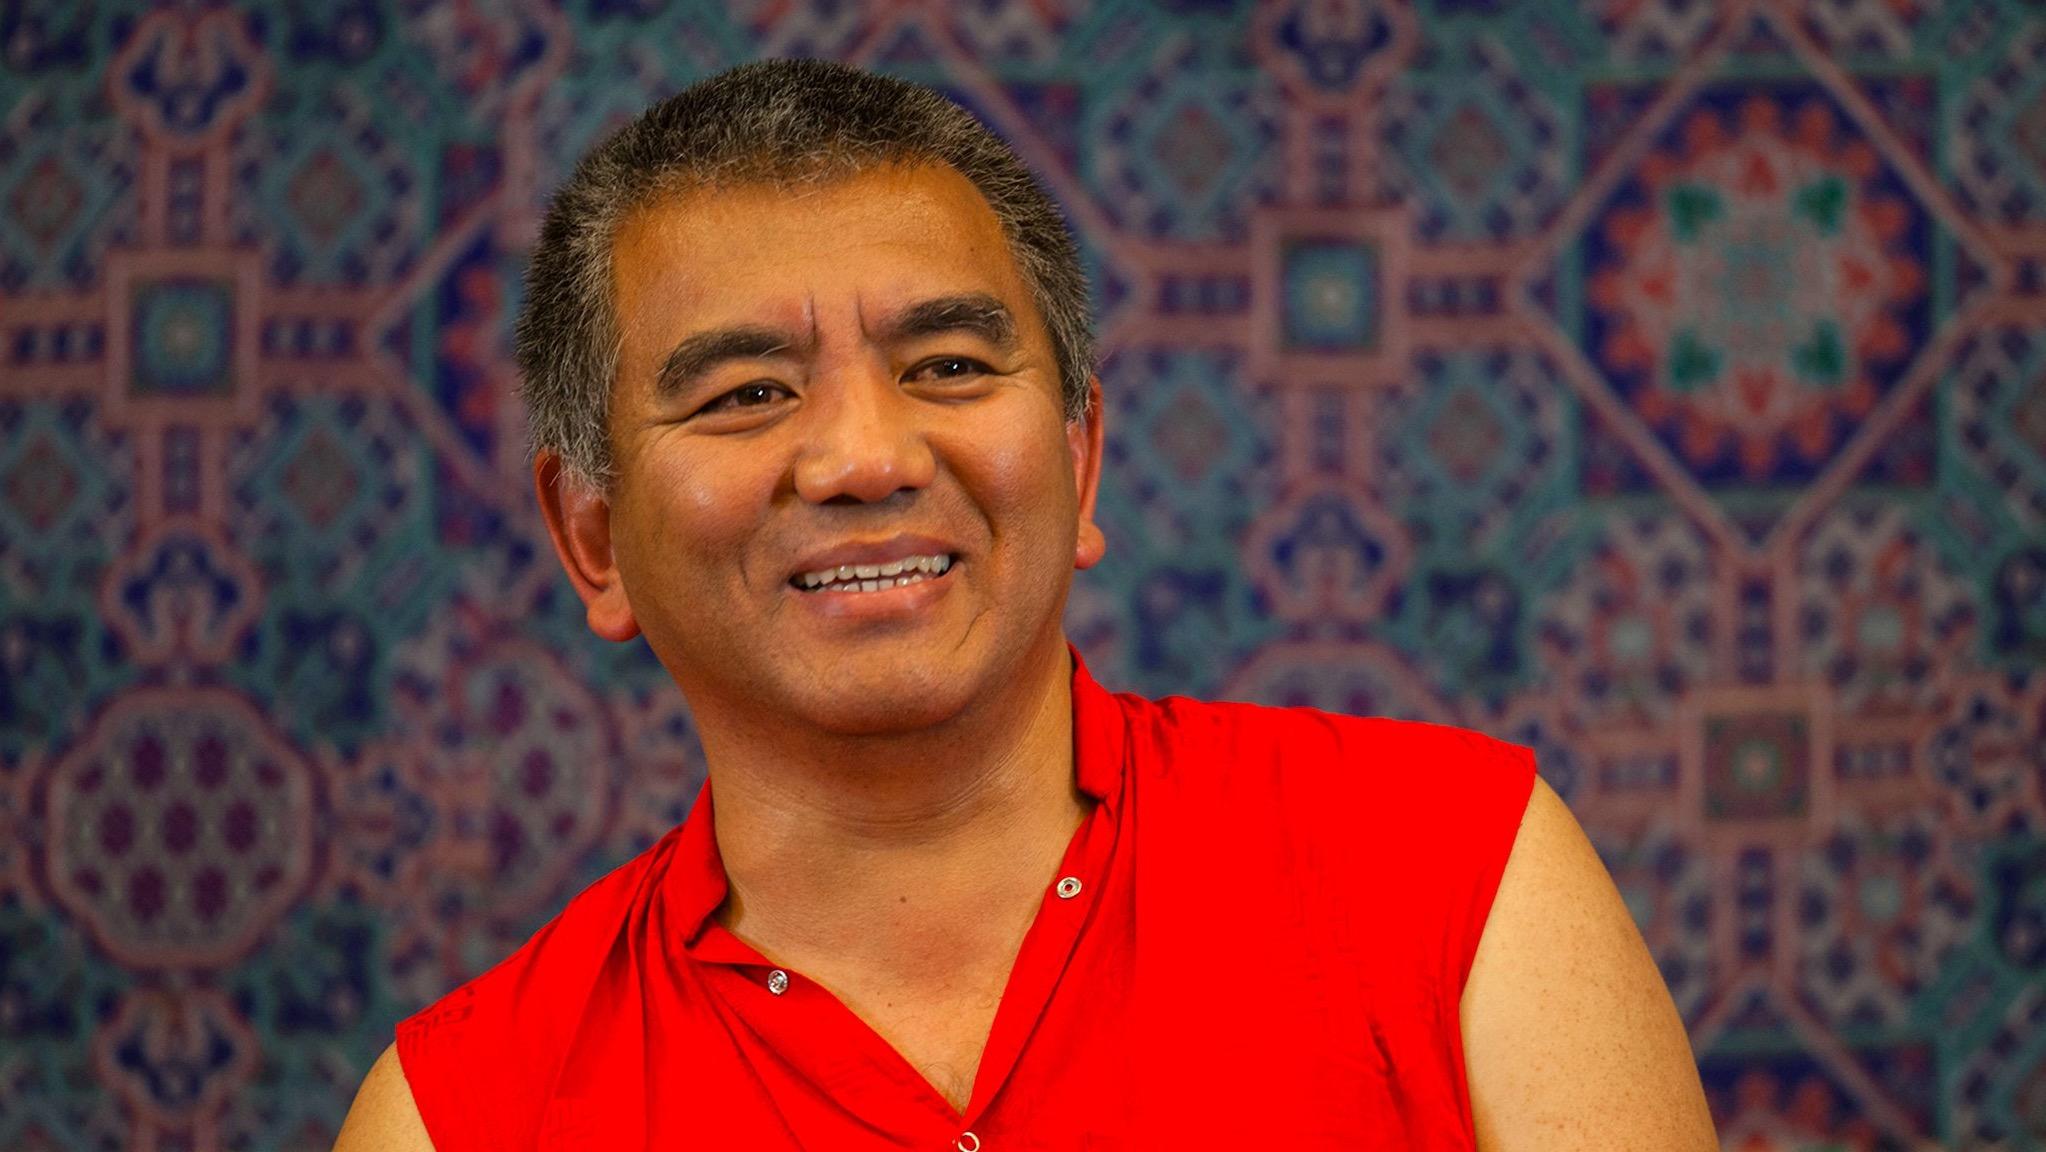 His Eminence the 7th Dzogchen Rinpoche